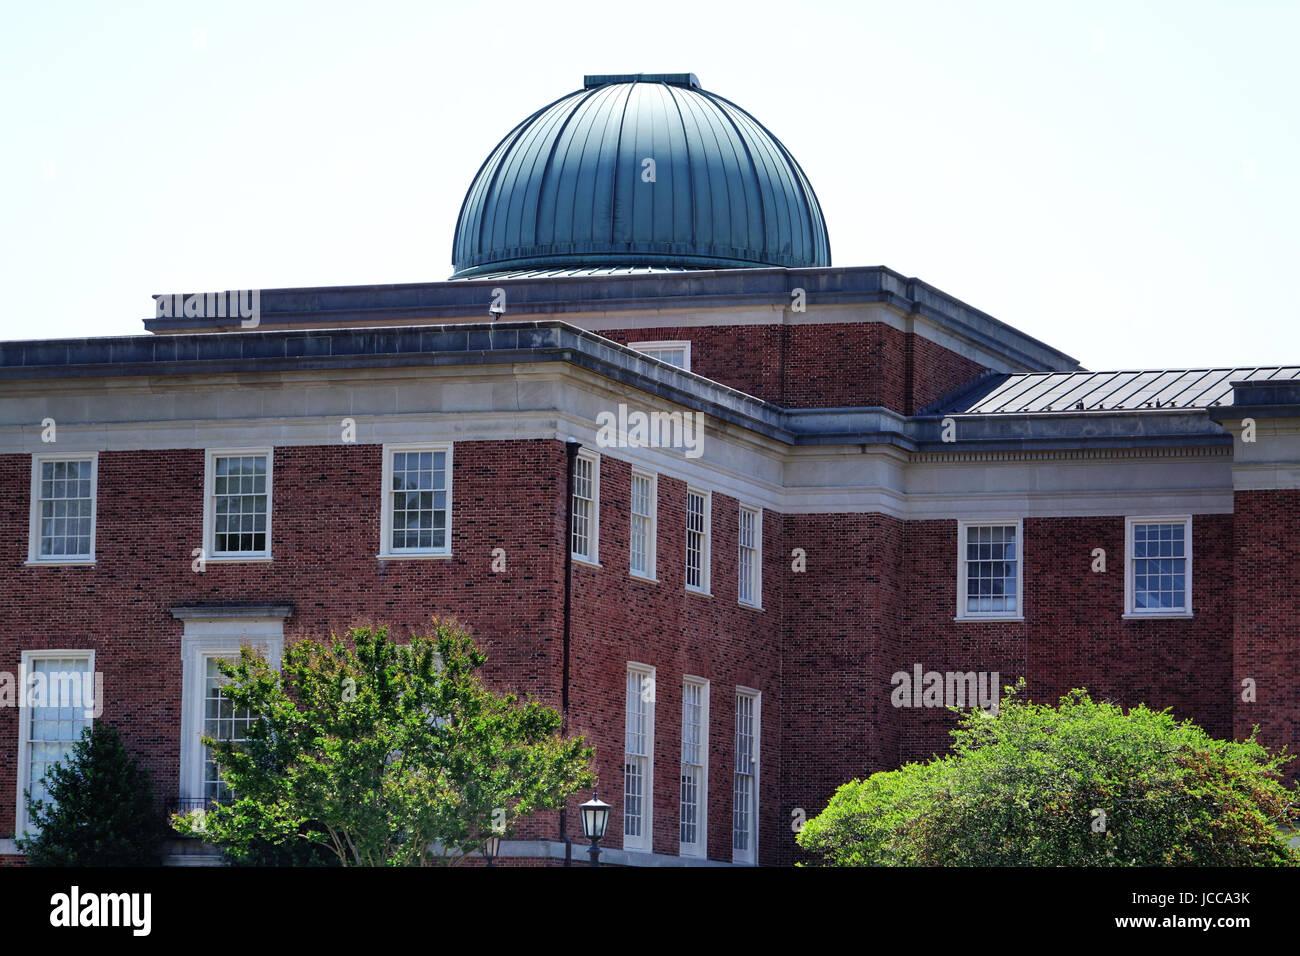 Morehead Planetarium building, Unversity of North Carolina, Chapel Hill, North Carolina - Stock Image